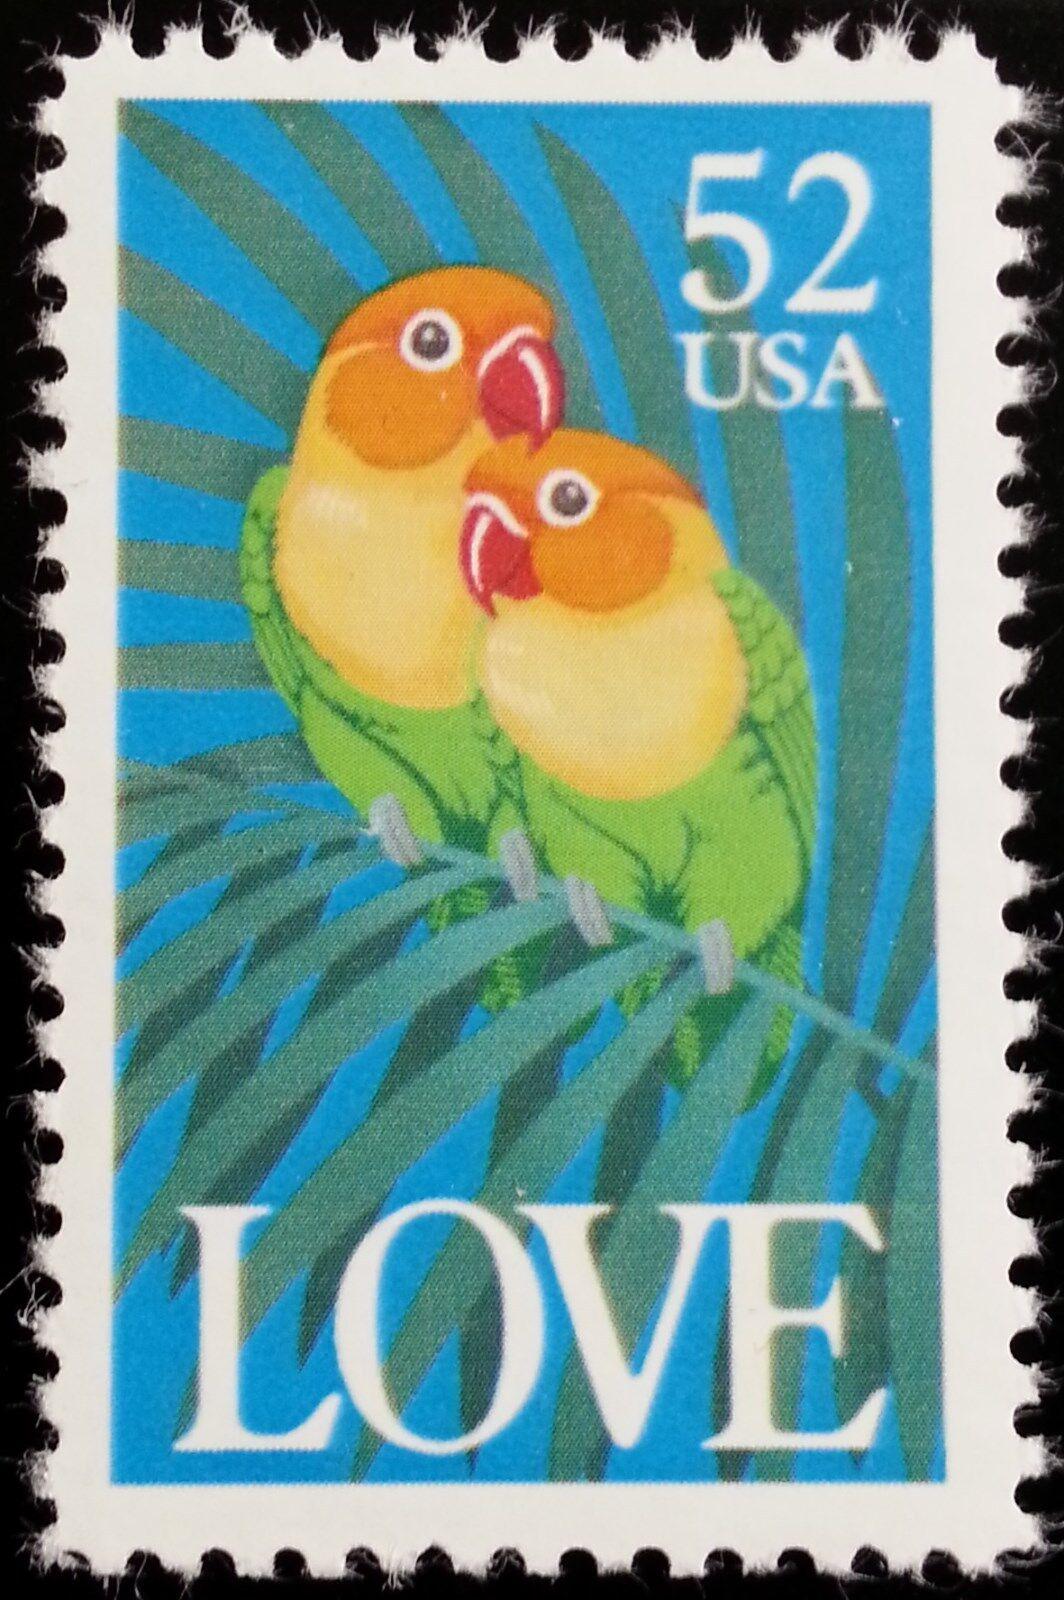 1991 52c Love, Colorful Parrots Scott 2537 Mint F/VF NH